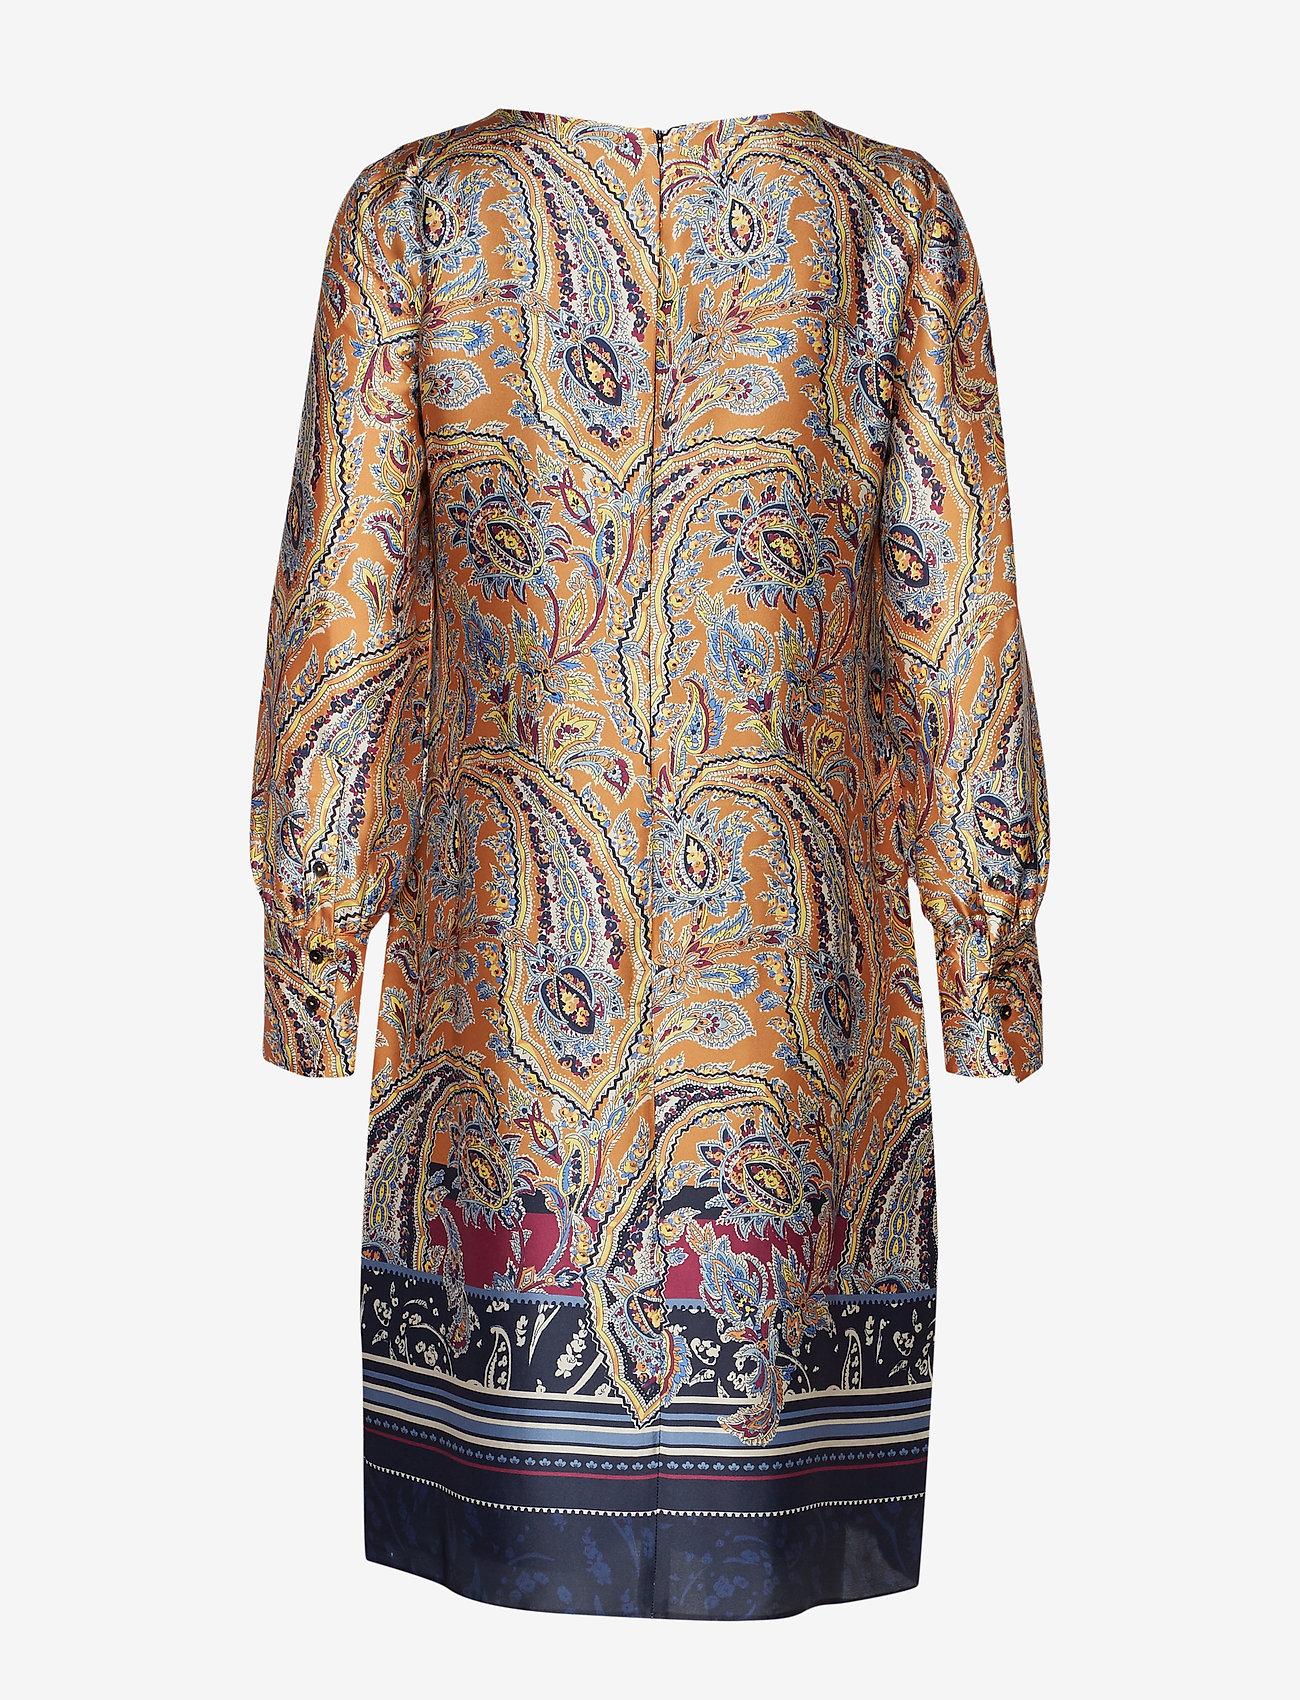 Dress Woven Fabric (Yellow Multicolor Print) (961.95 kr) - Gerry Weber